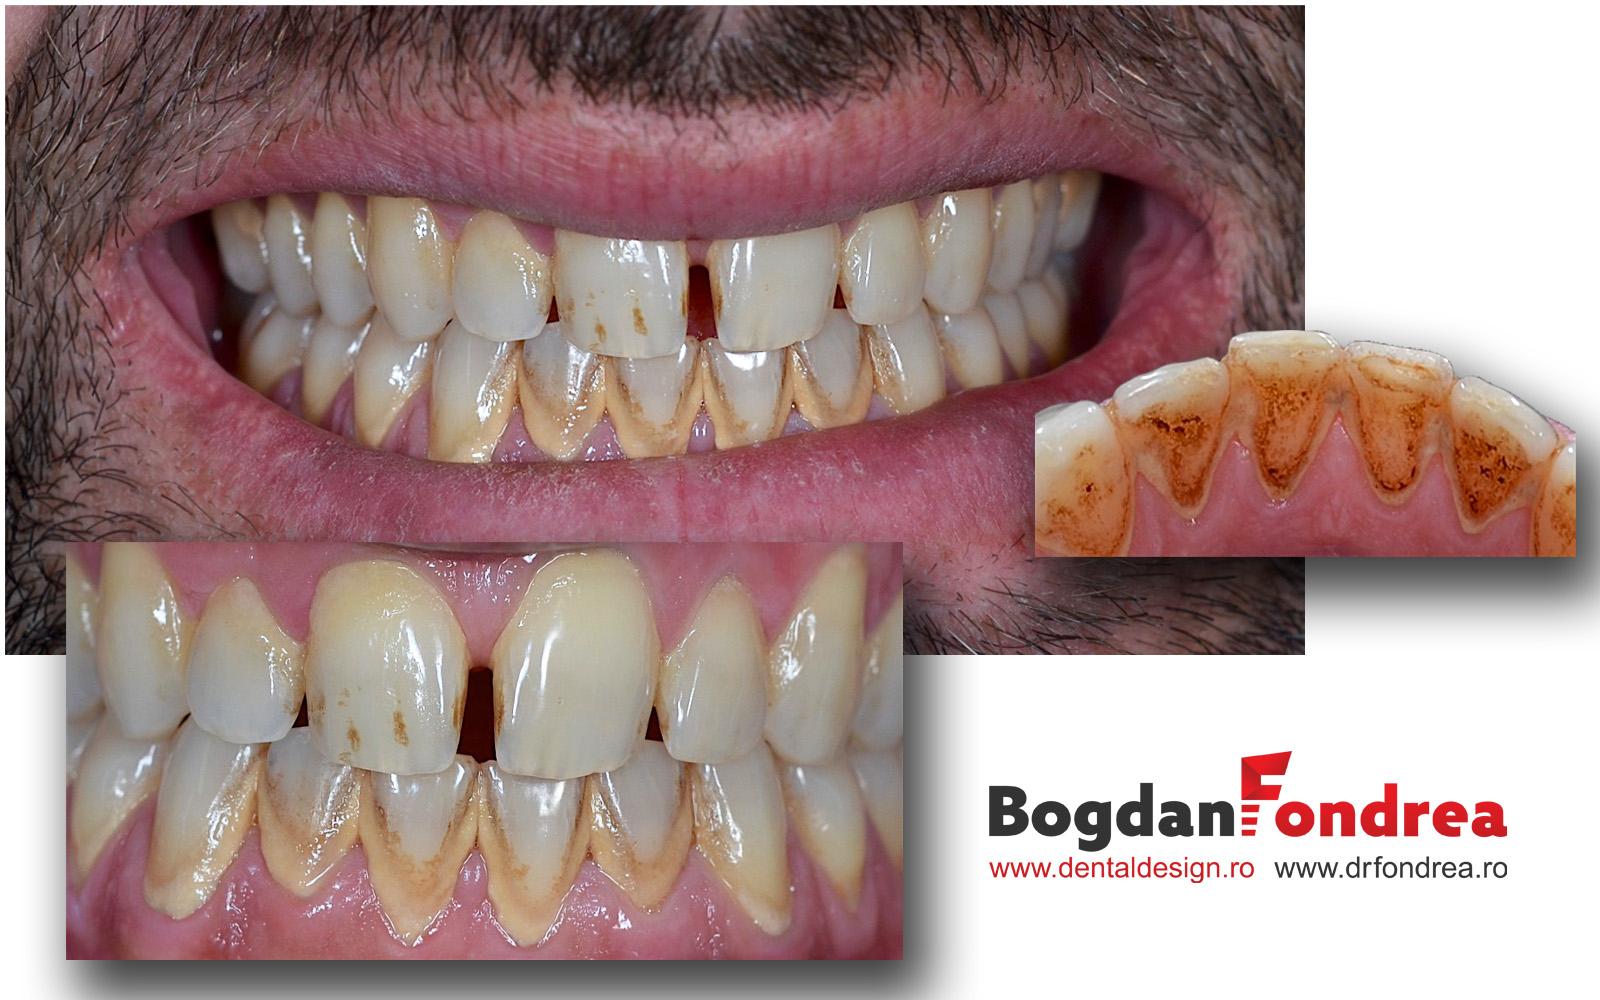 Tartru placa bacteriana dinti